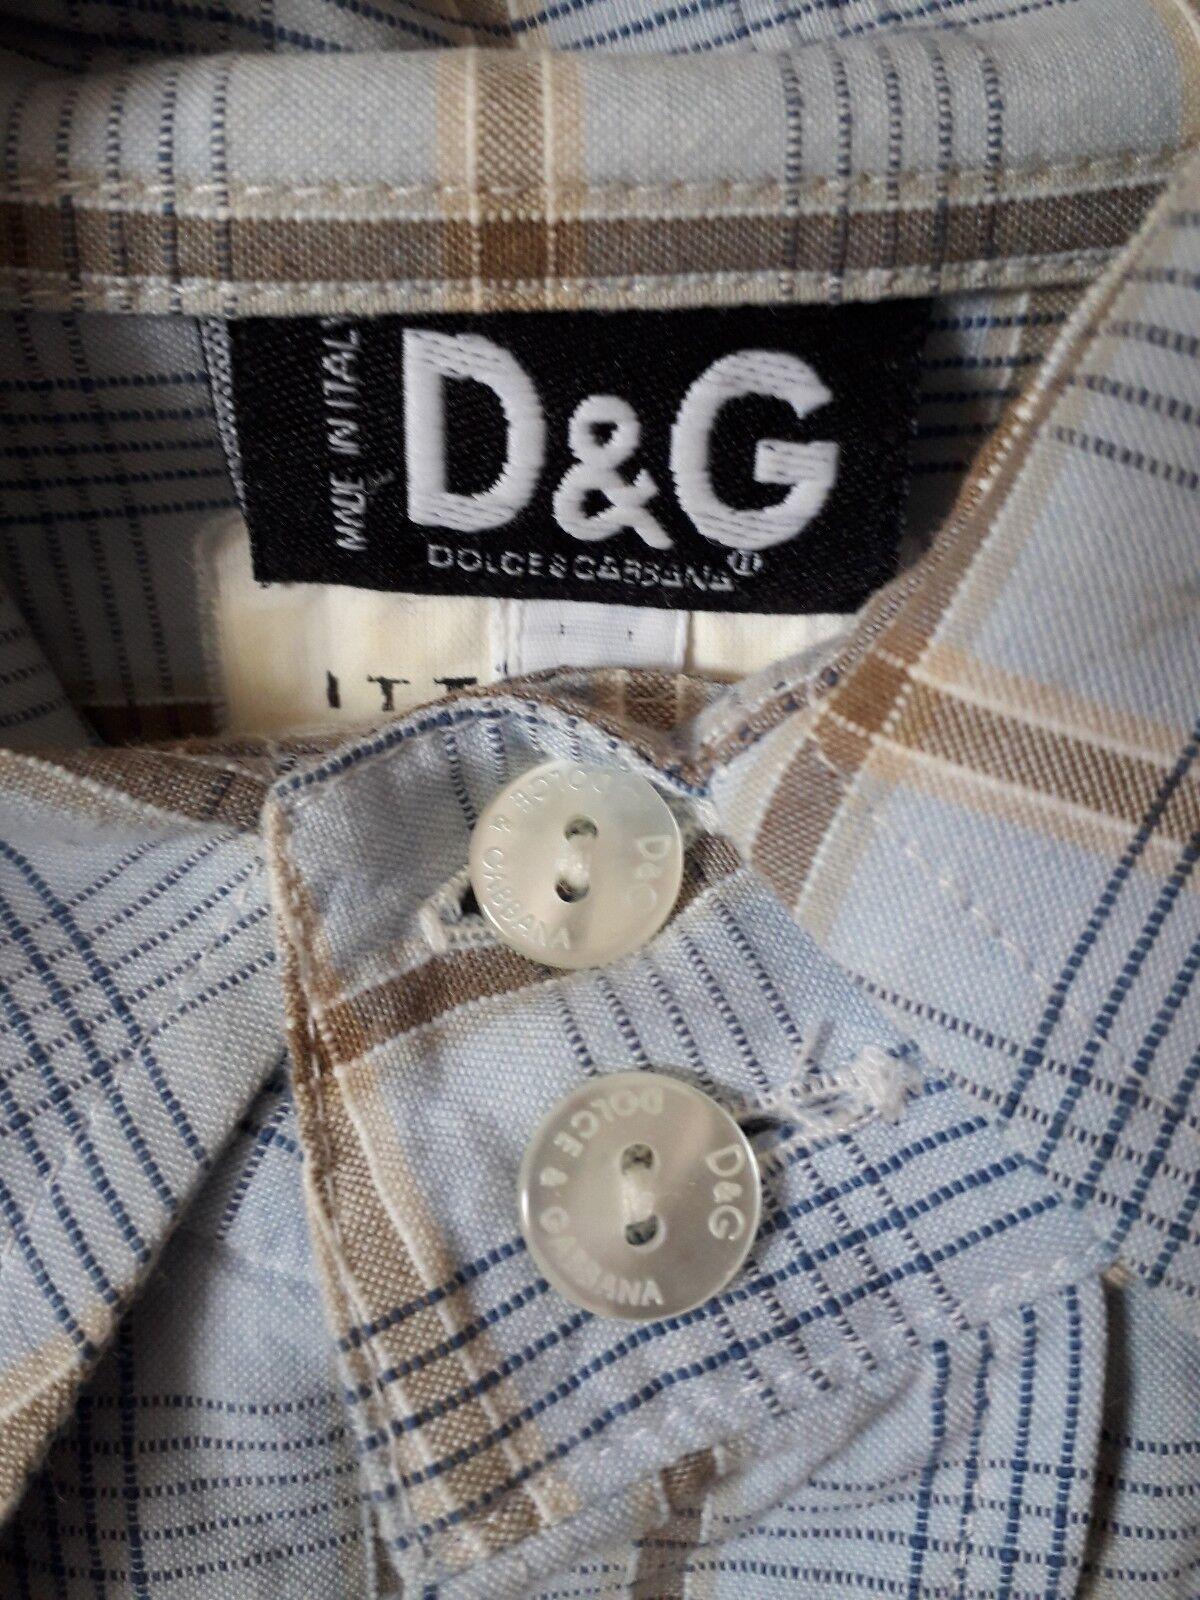 Vintage & Camicia Dolce & Vintage Gabbana Originale Unica Introvabile Bottone D&G b75ee3